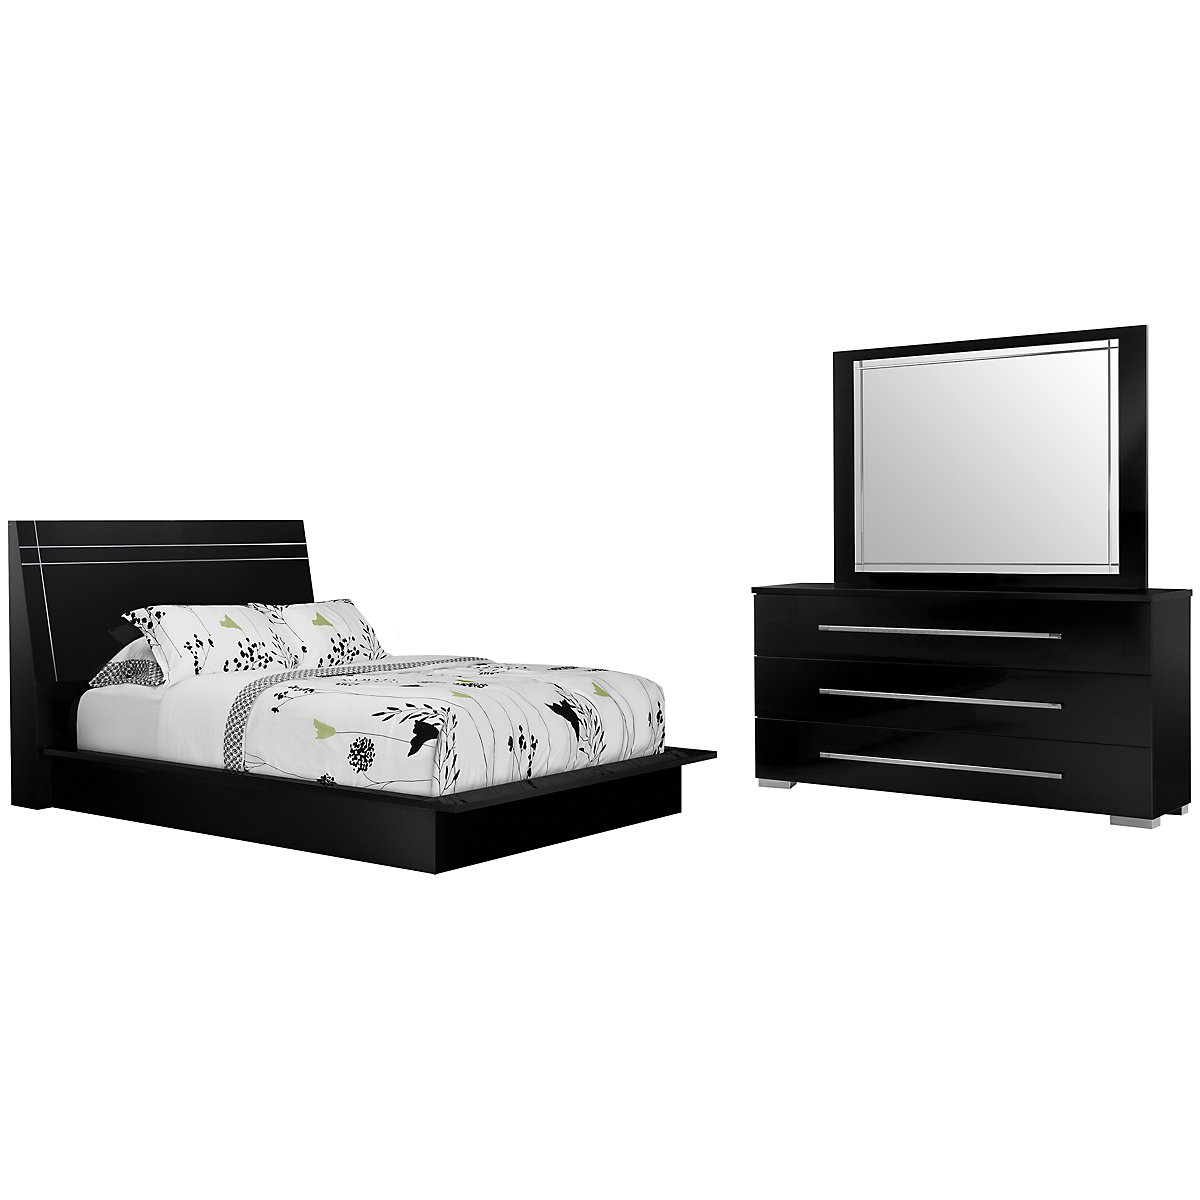 Pineapple Bedroom Furniture City Furniture Bedroom Furniture Complete Bedroom Sets